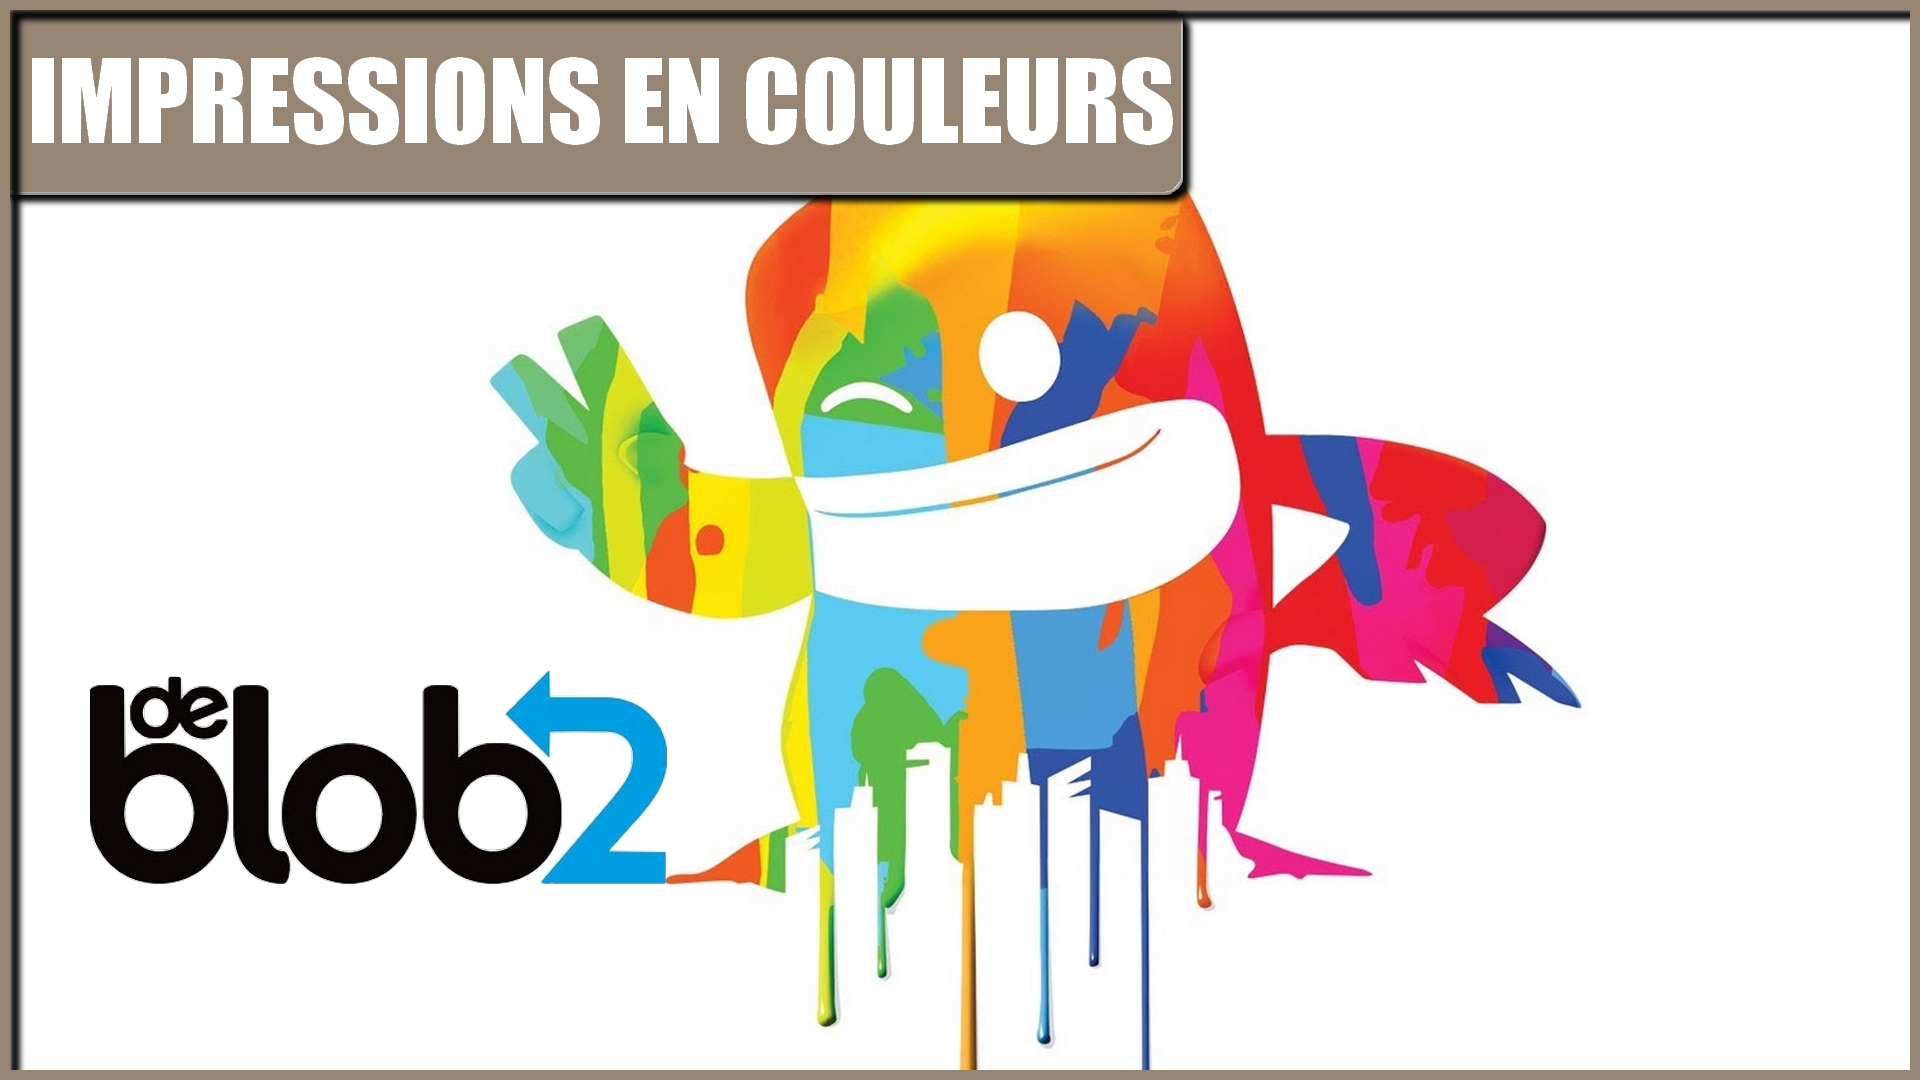 De Blob 2 Remastered : Impressions en couleurs